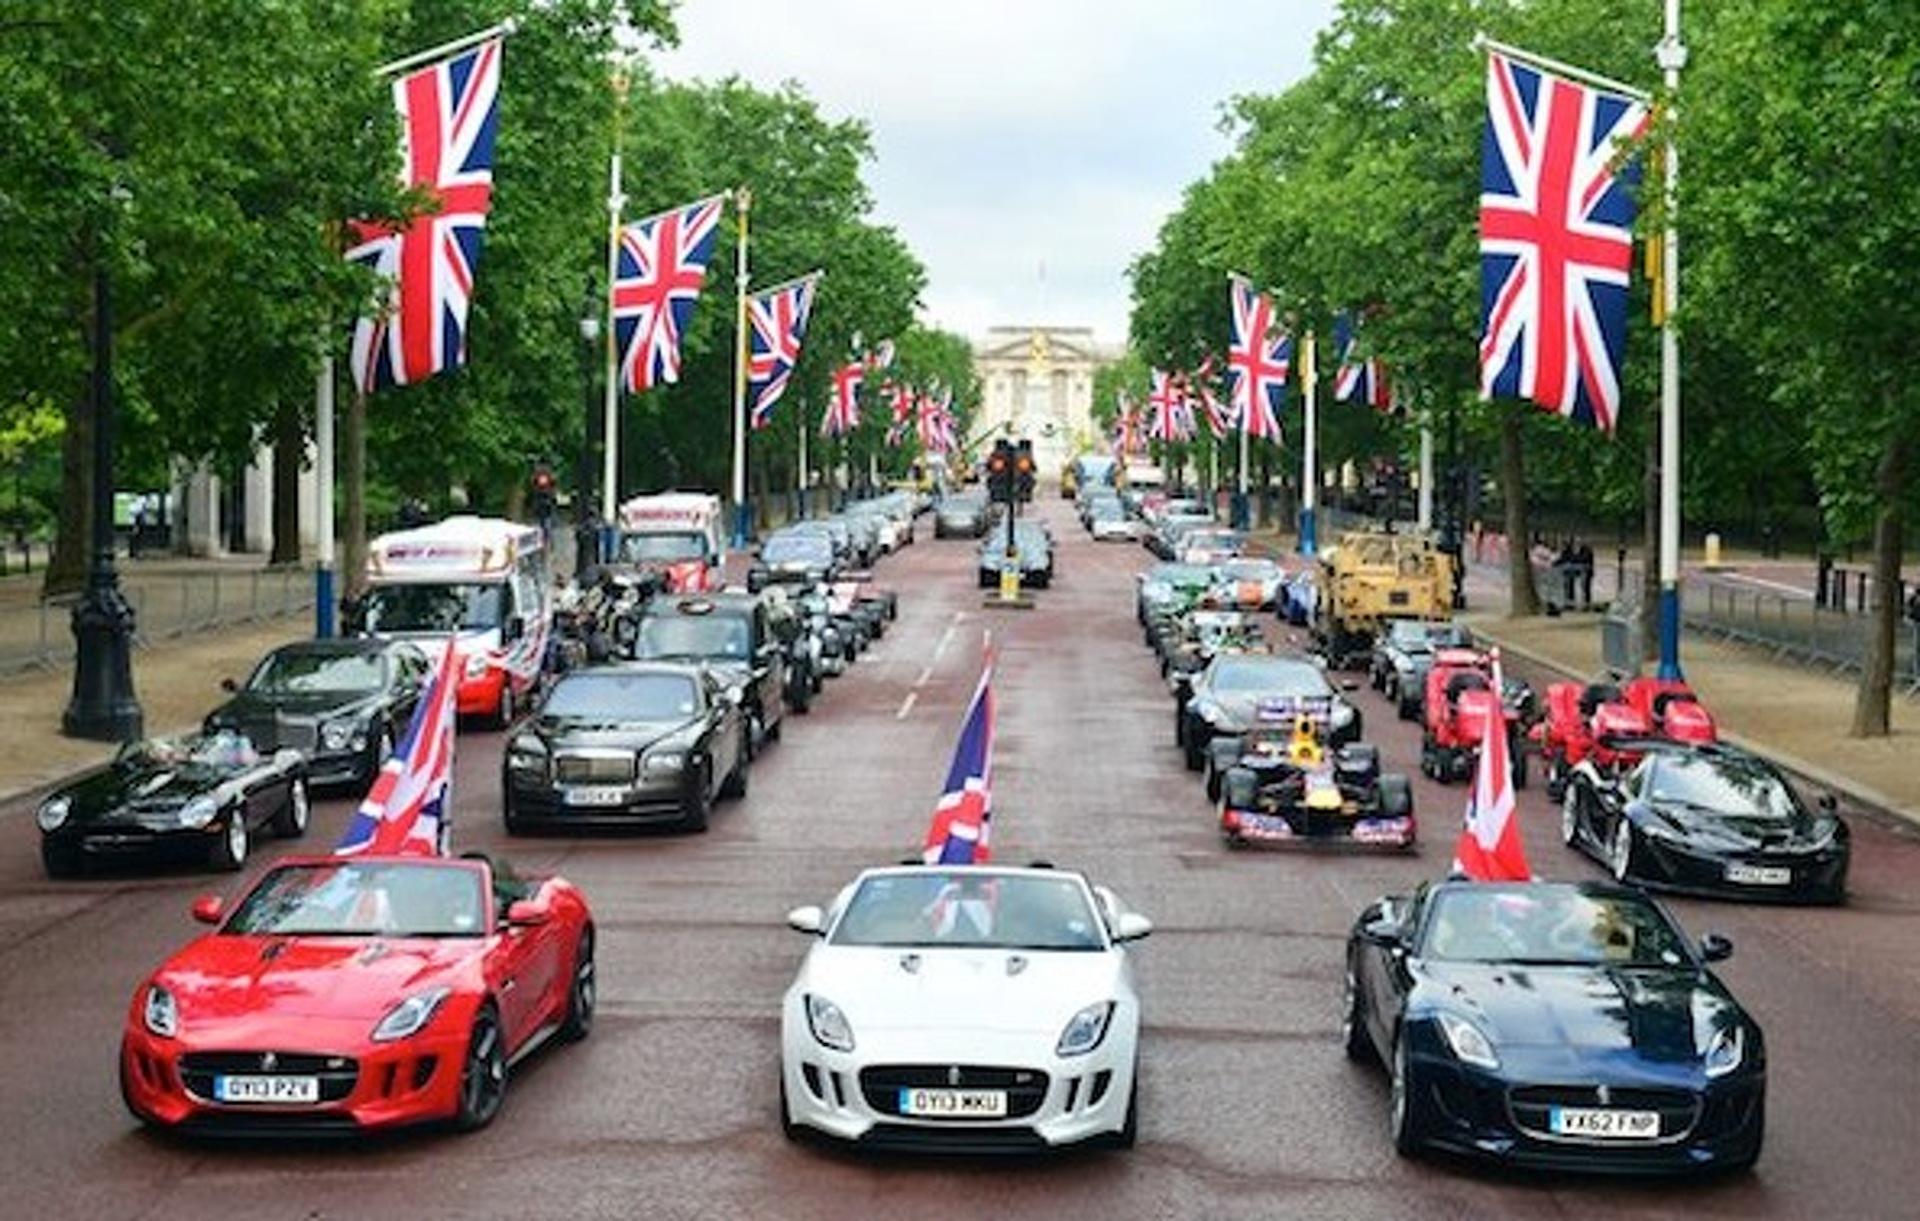 McLaren P1 Spotted in London, Filming for Top Gear? [UPDATE] Yep, Top Gear